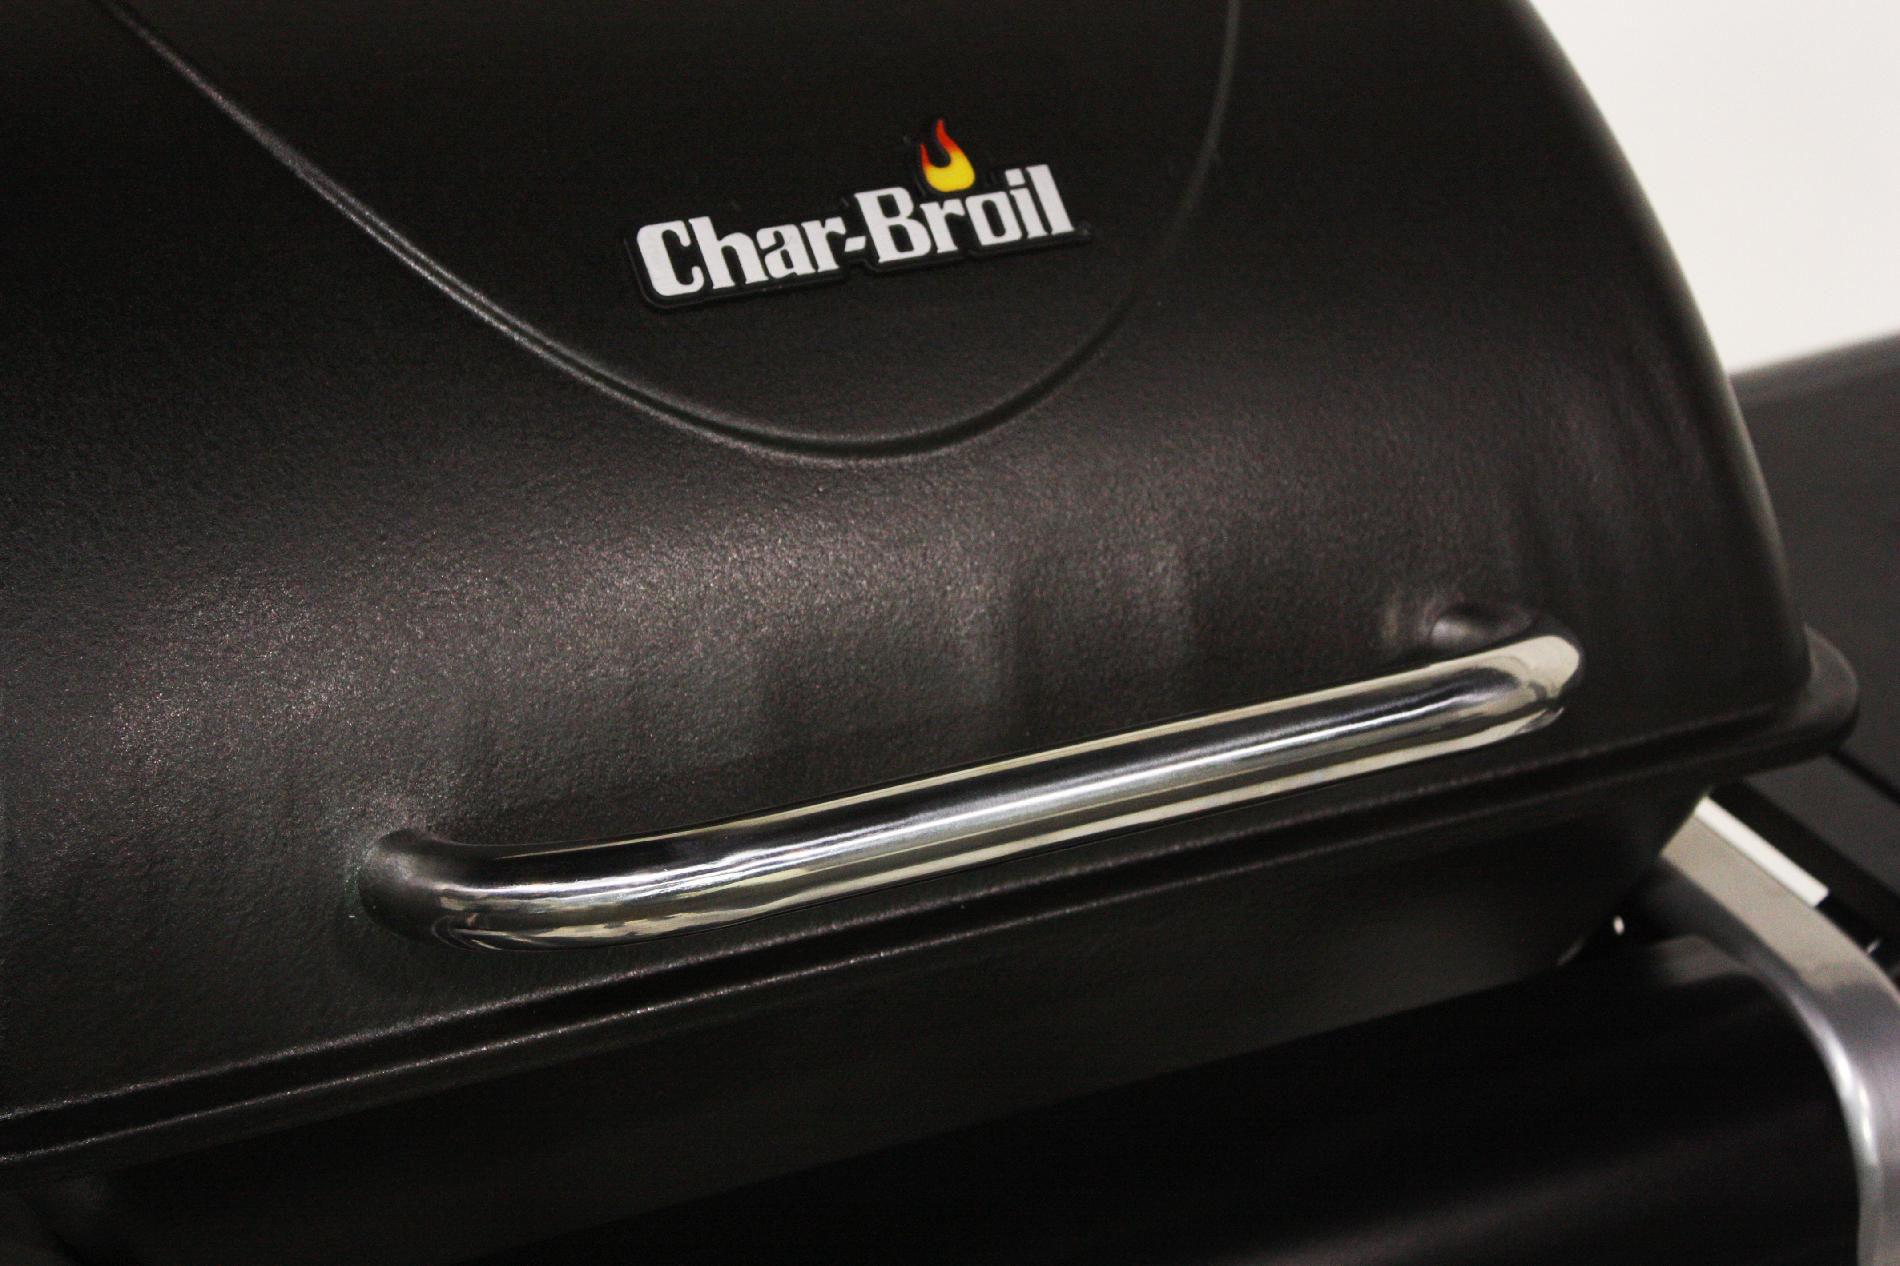 Char-Broil 2-Burner LP Gas Grill